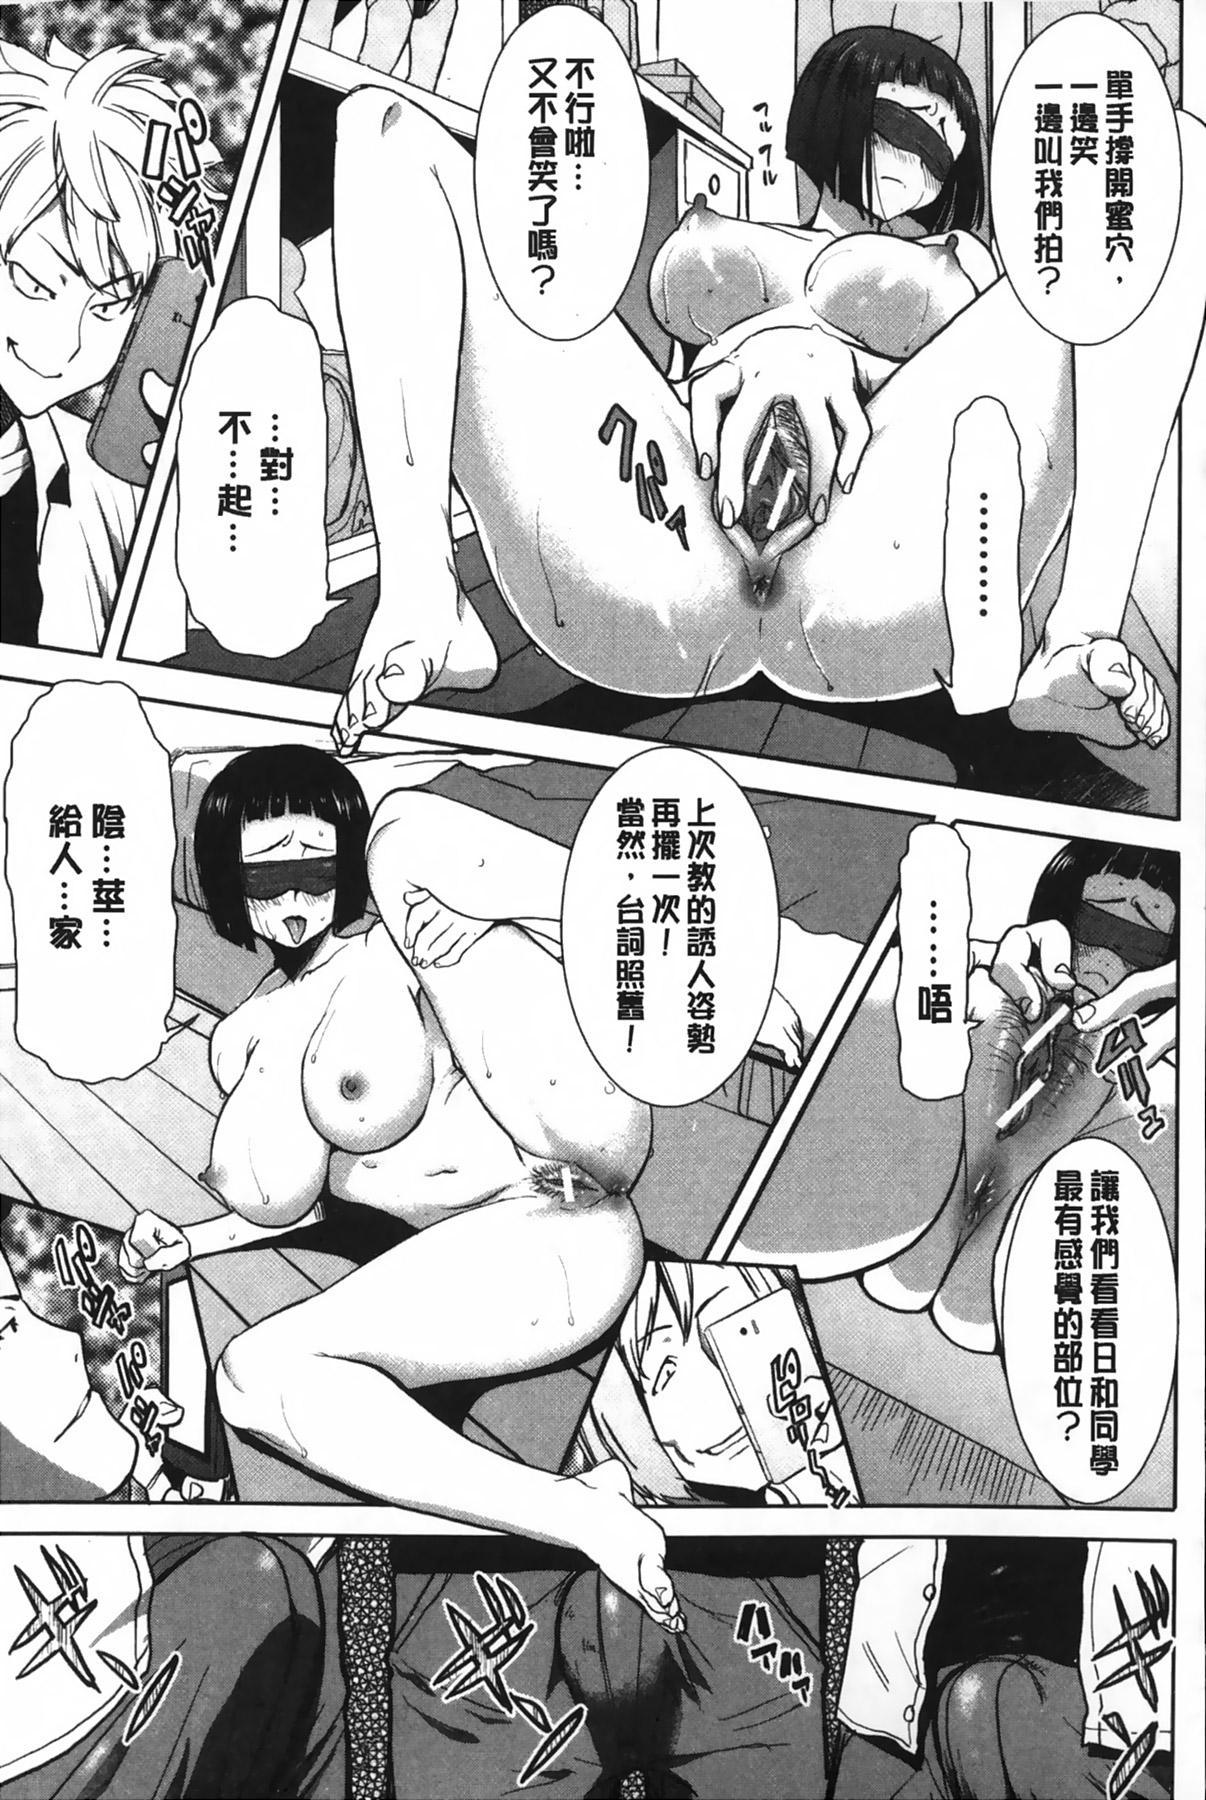 Ane Unsweet - Mihiragi Hiyori + | 姊姊不甜美 彌平木日和+ 49